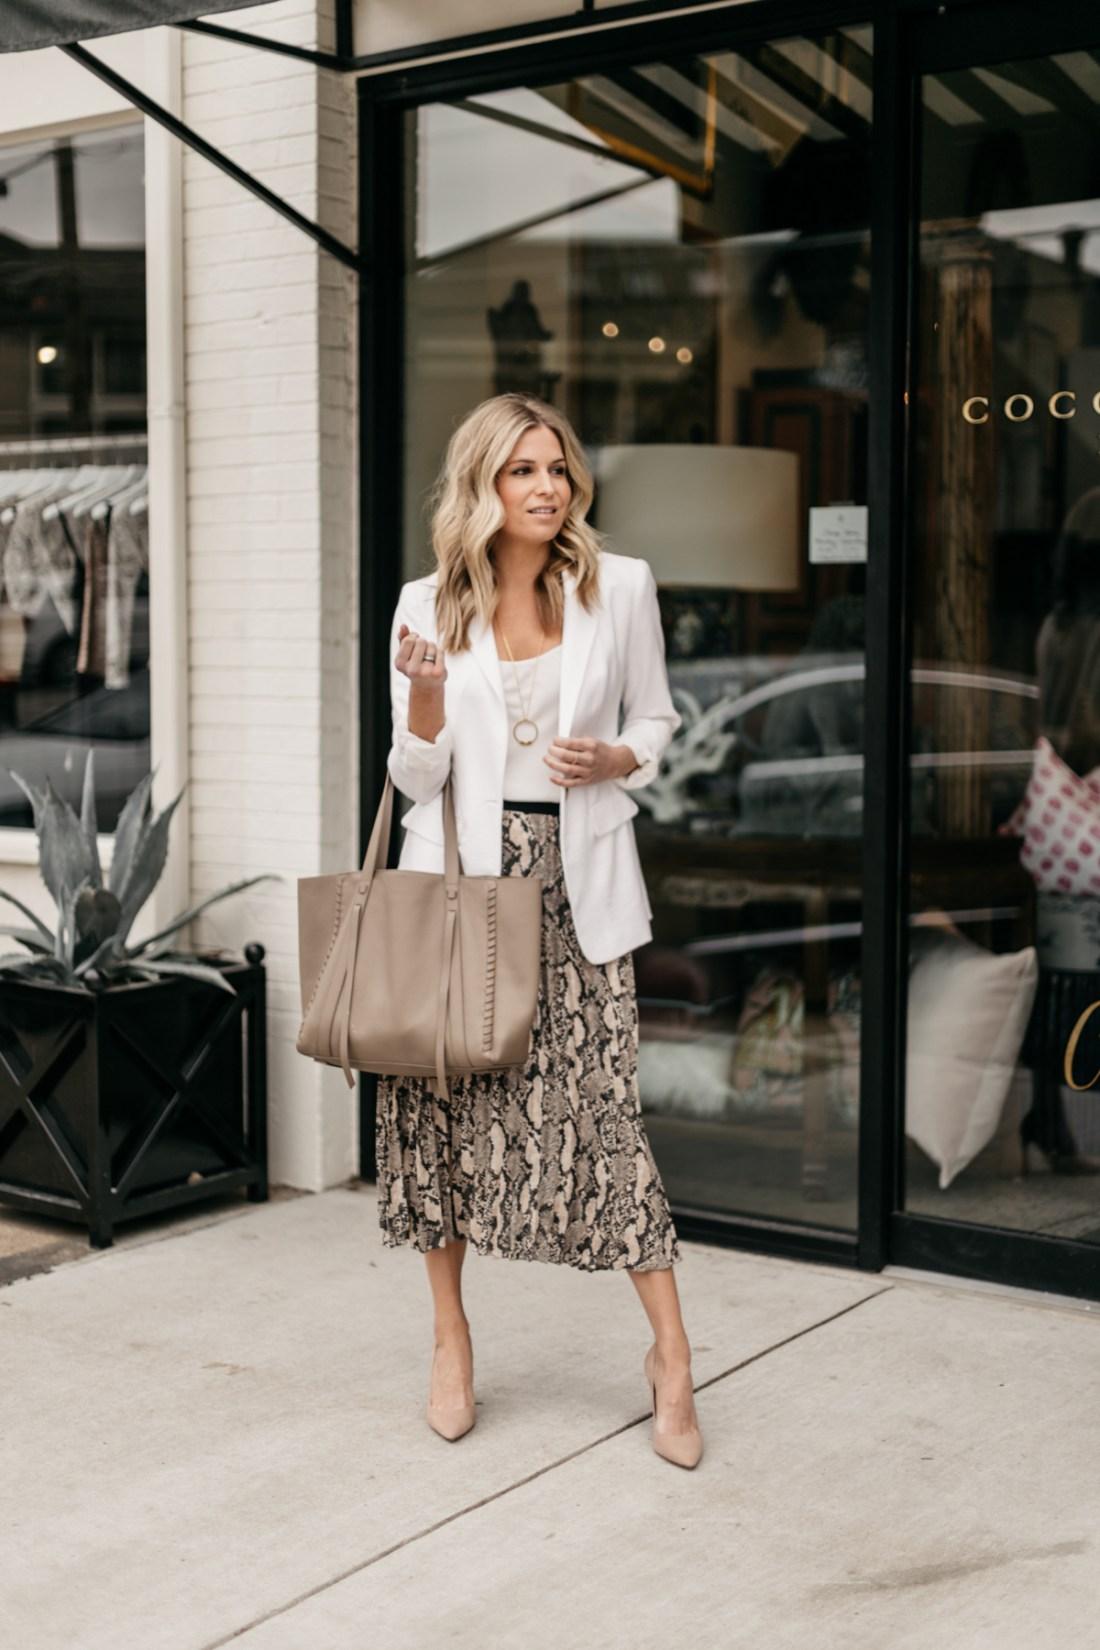 5 WAYS TO WEAR ANIMAL PRINT SKIRTS, brooke burnett, dallas fashion blogger, white oversized blazer